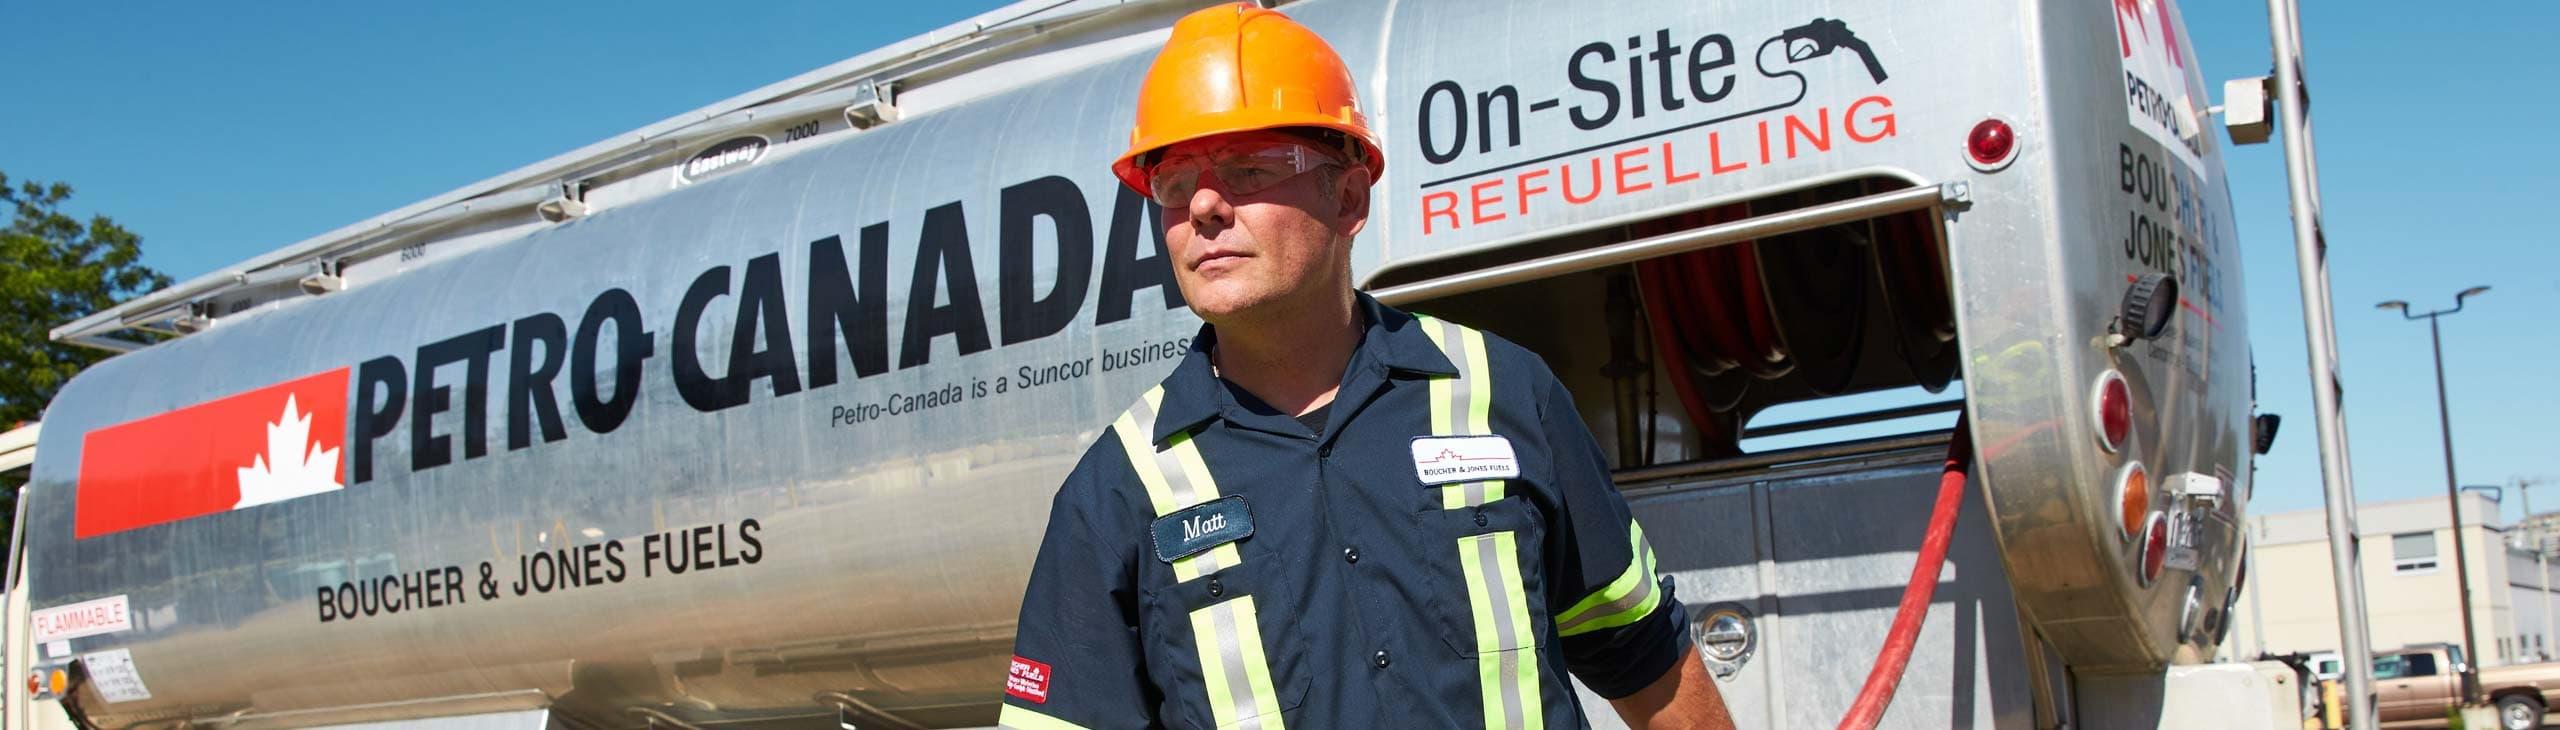 Un technicien qui livre du carburant en vrac avec un de nos camions.